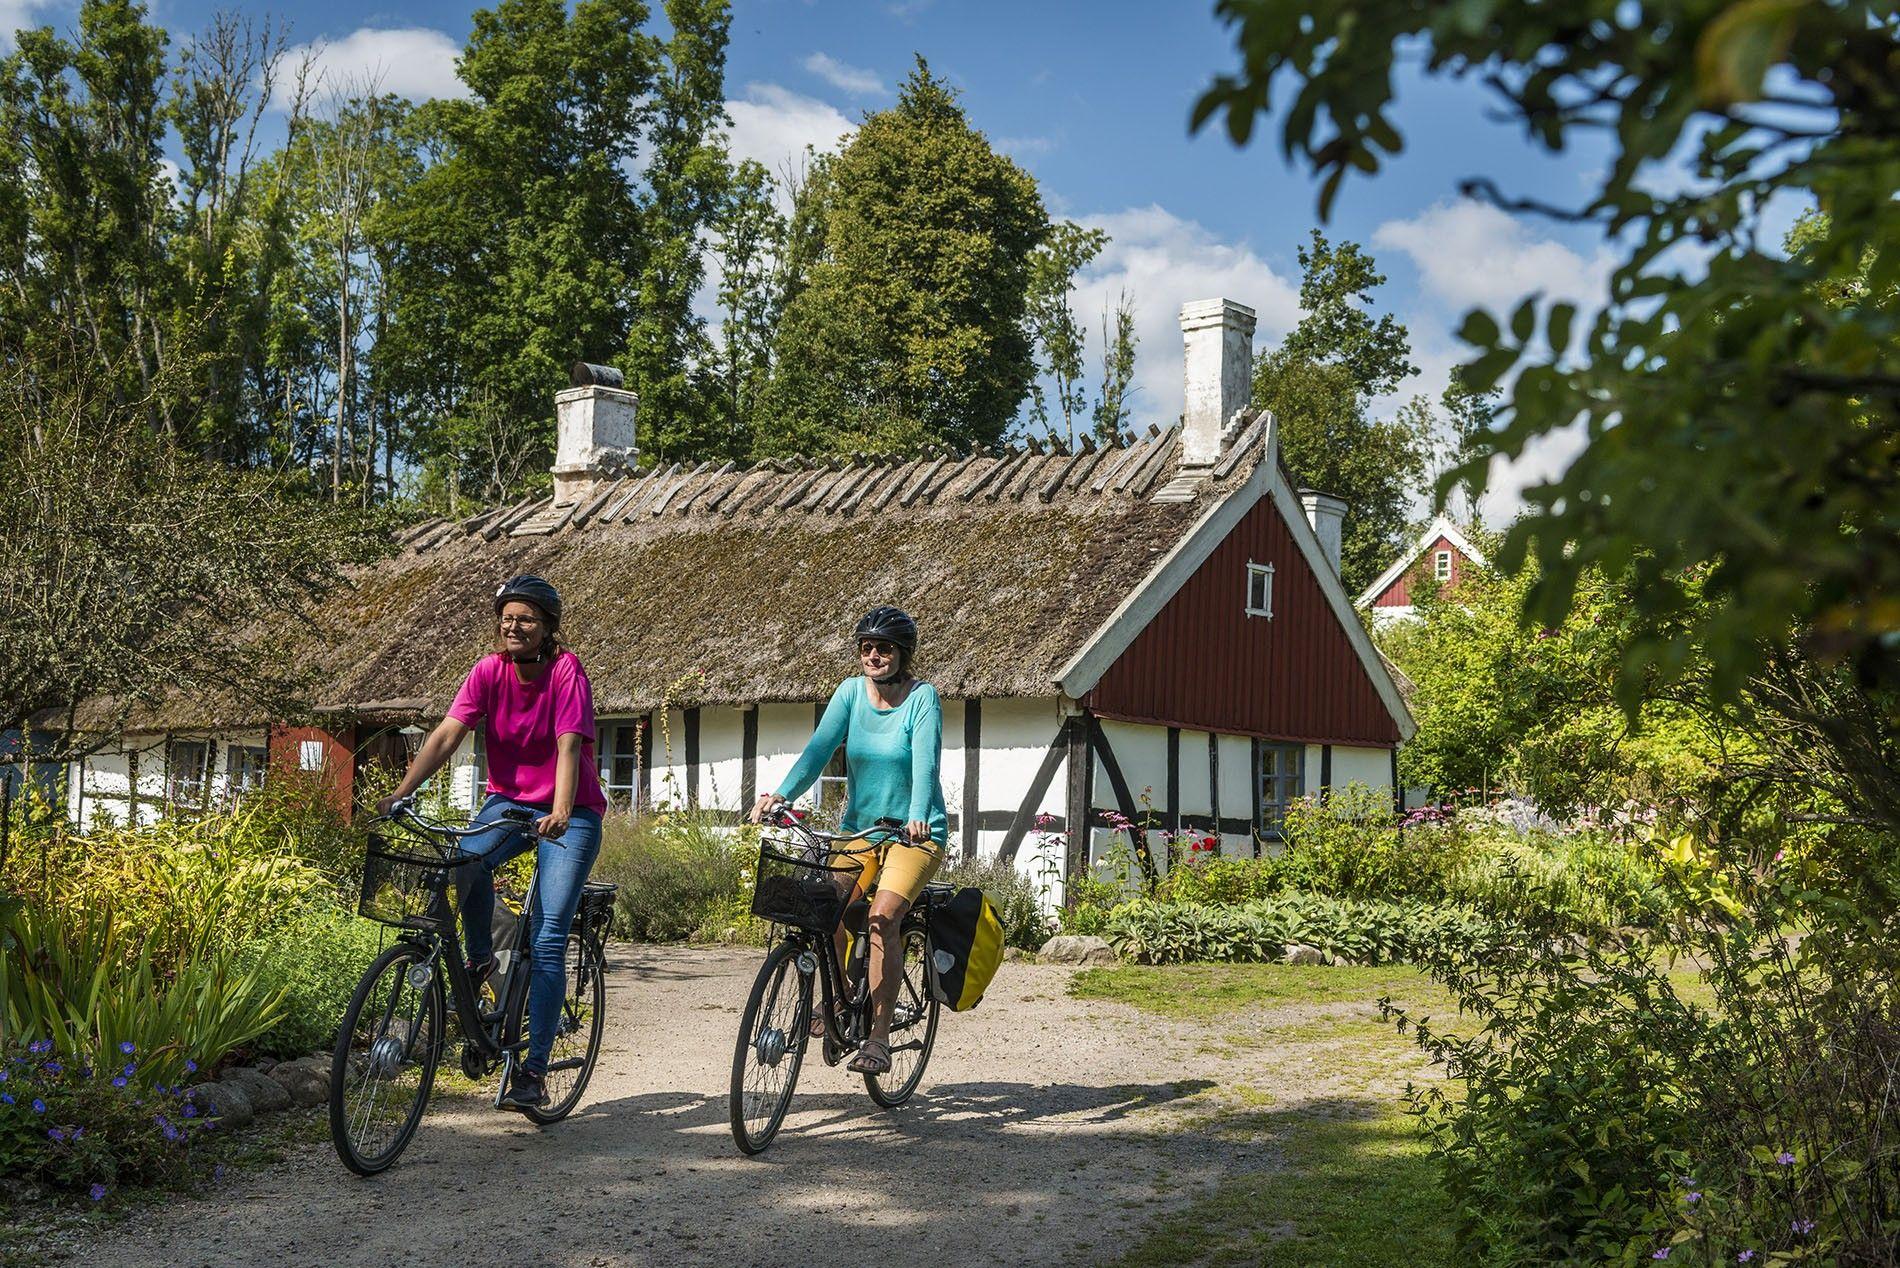 Cycling along the Syndostleden in Skane